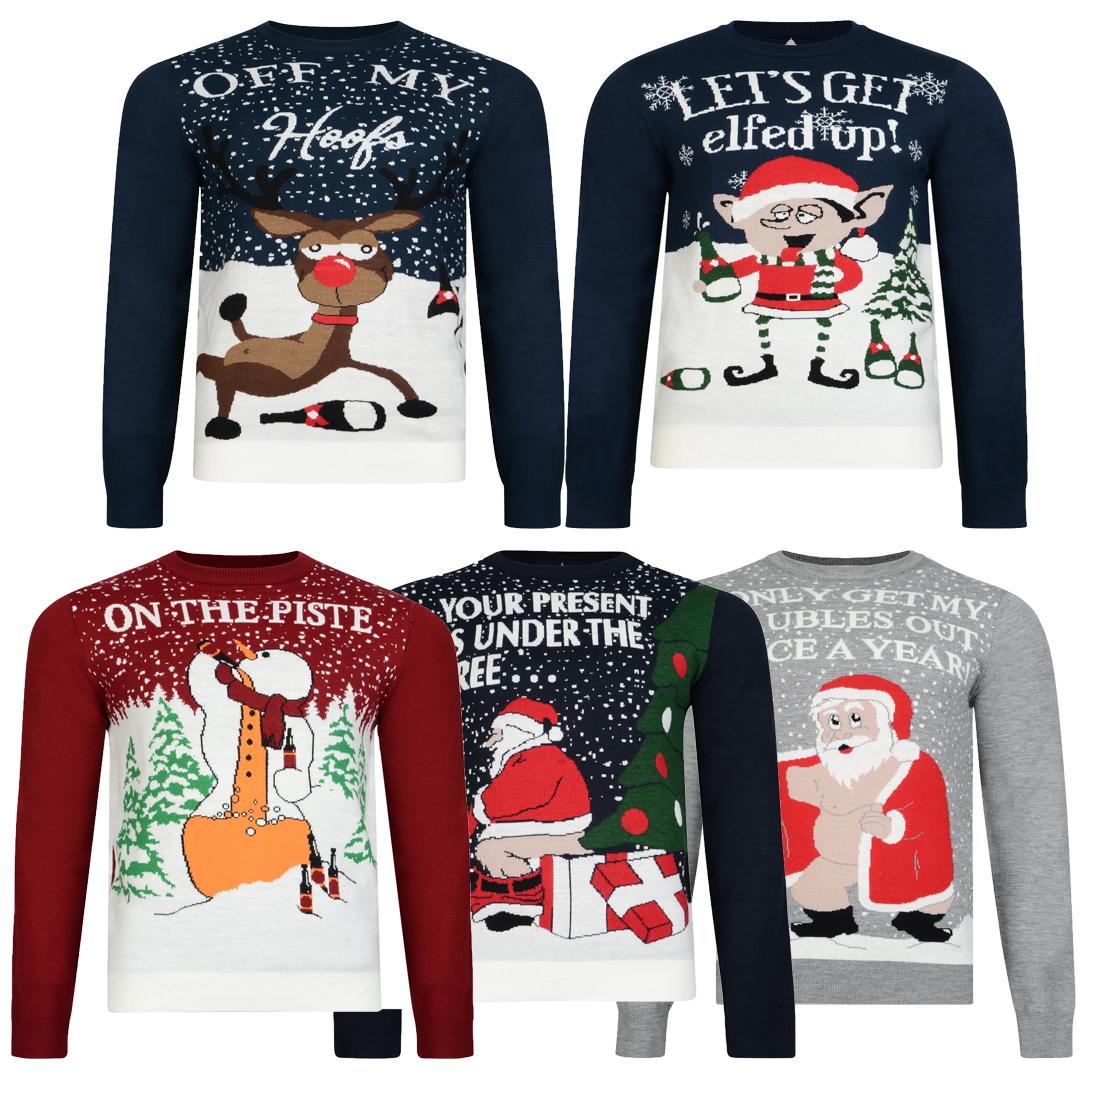 8aa641f9ea8e mens-threadbare-christmas-novelty-party-knitted-jumpers-STONE-REPUBLIC-main.jpg